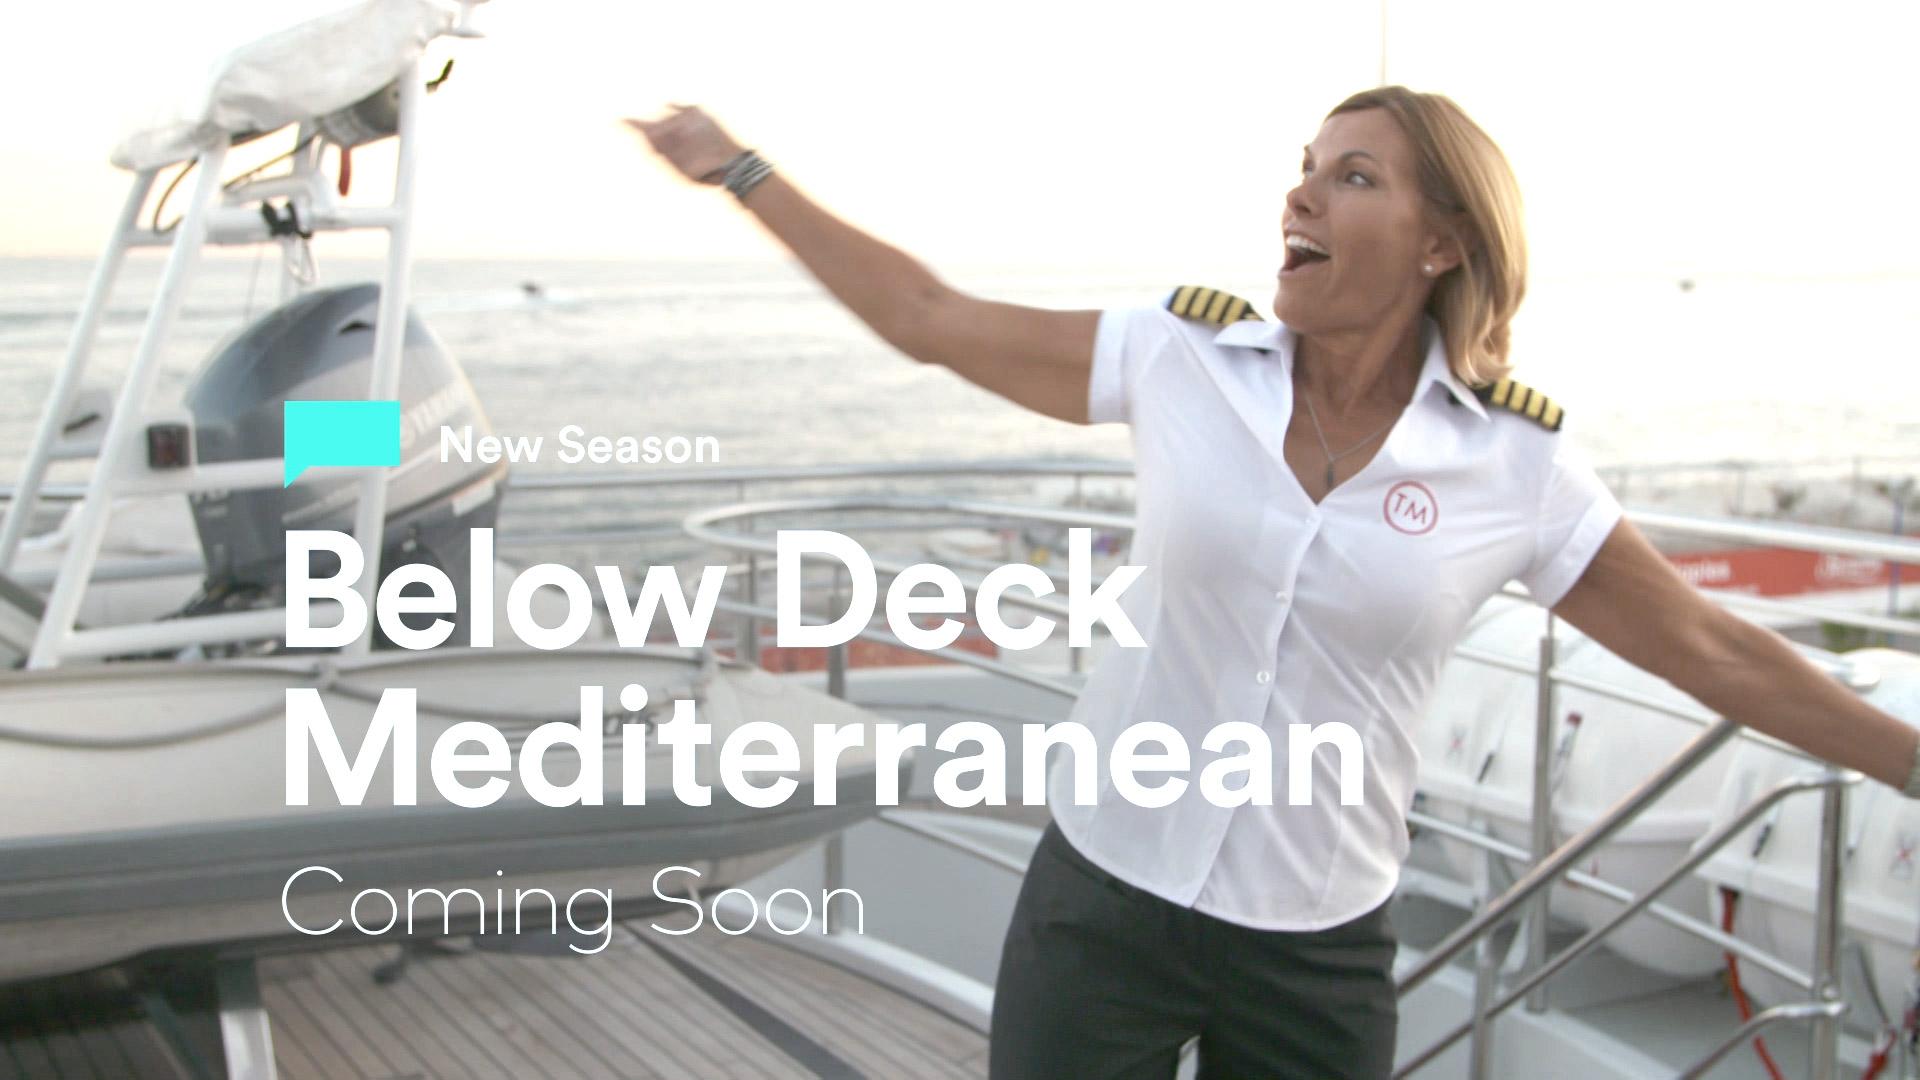 Below Deck Mediterranean Season 3 Premiere Date, Returning